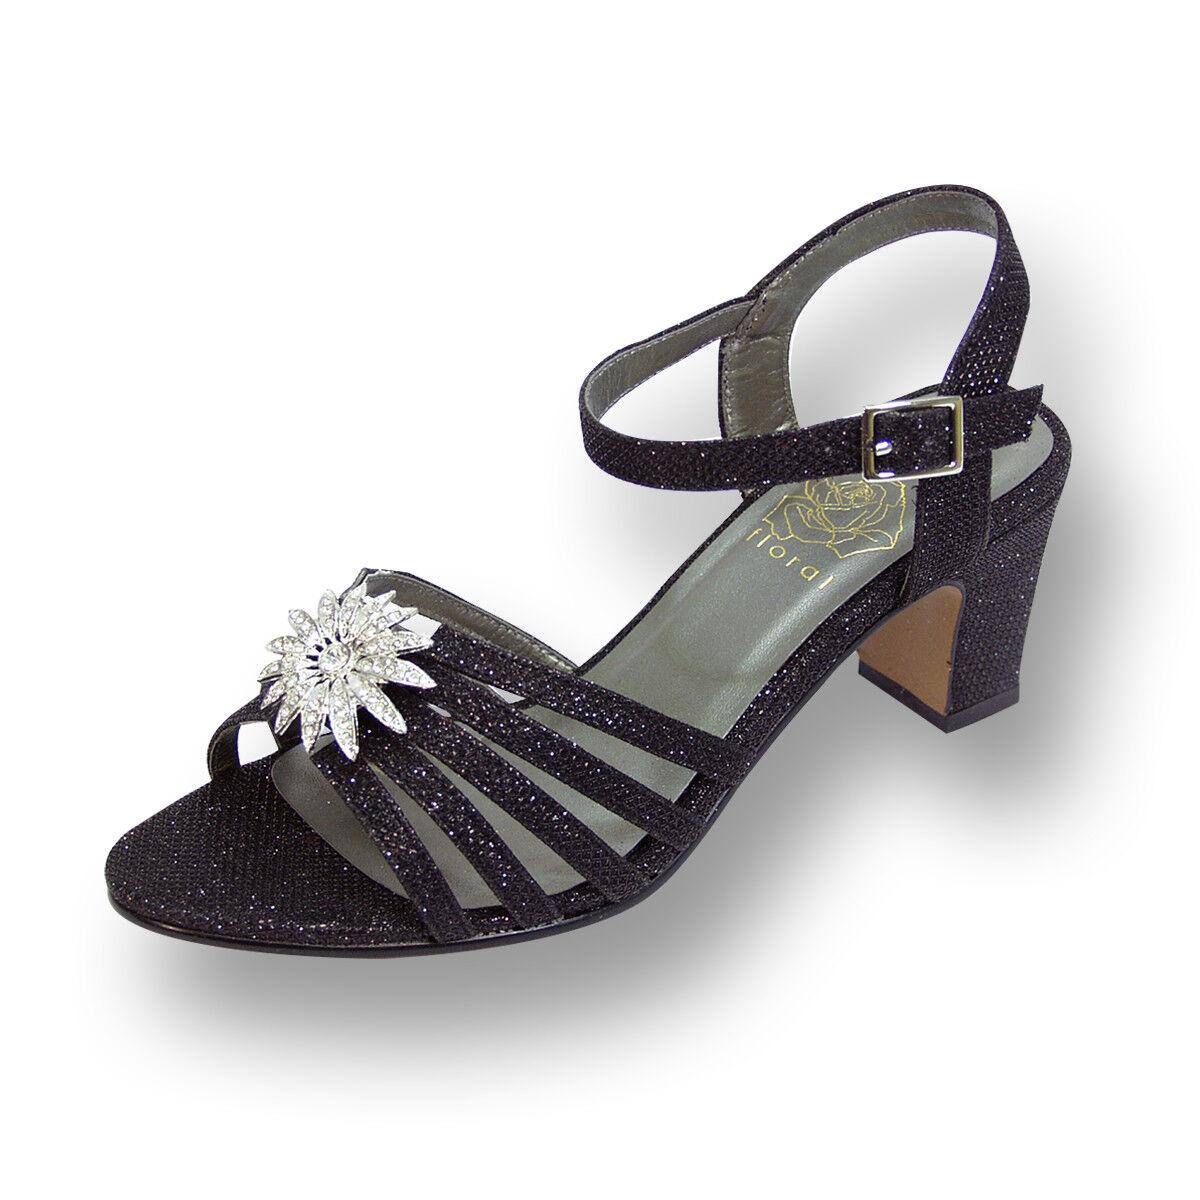 FIC FLORAL Melina Damens Wide Width Ankle Strap Buckle Rhinestone Flower Sandale